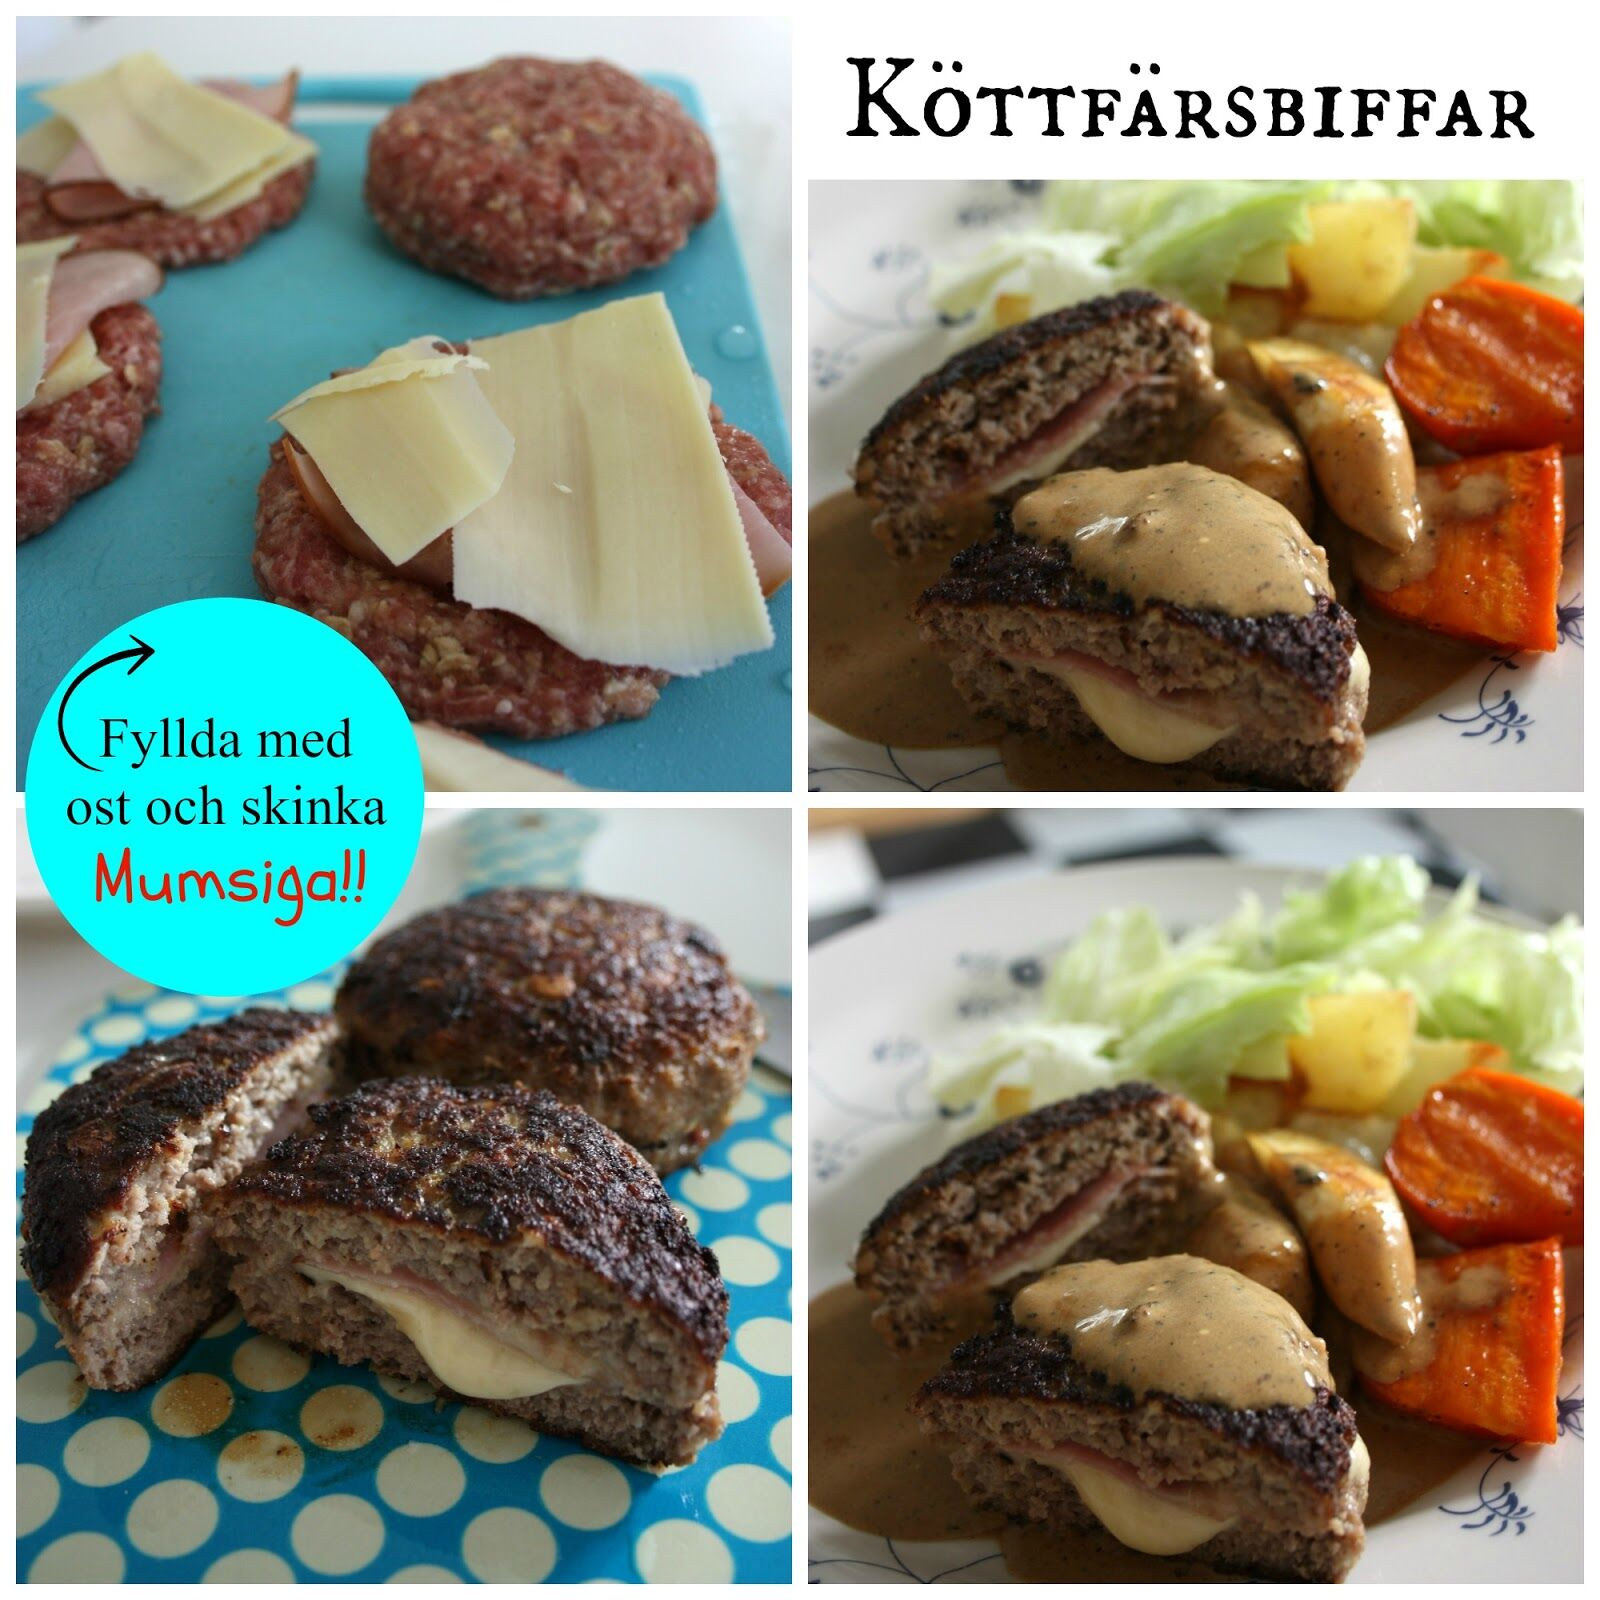 köttfärsbiffar (2)